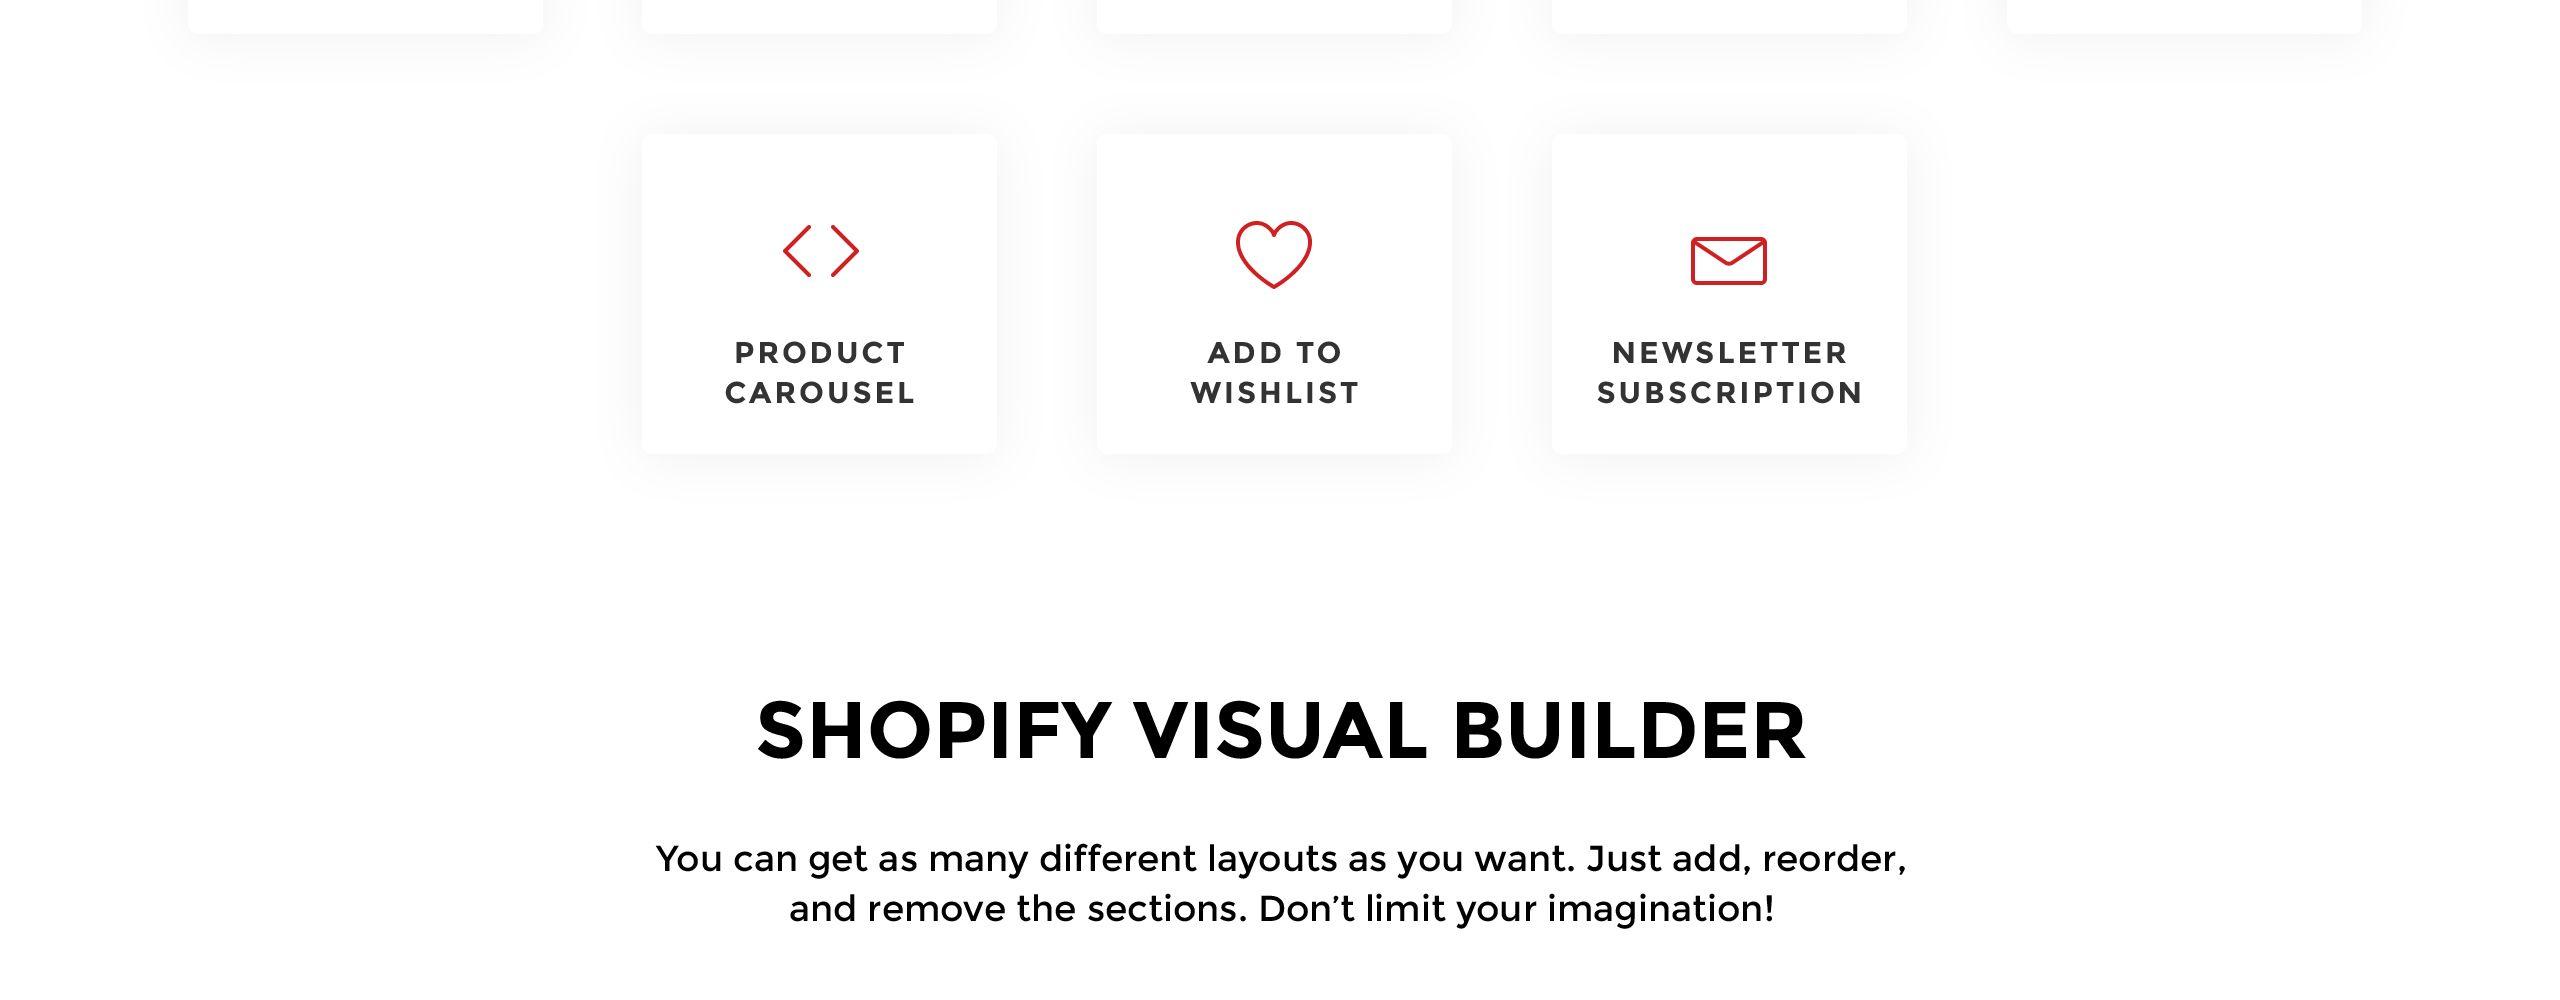 Vendixia Vending Machines Clean Shopify Theme 77801 Shopify Templates Shopify Theme Clothing Store Website